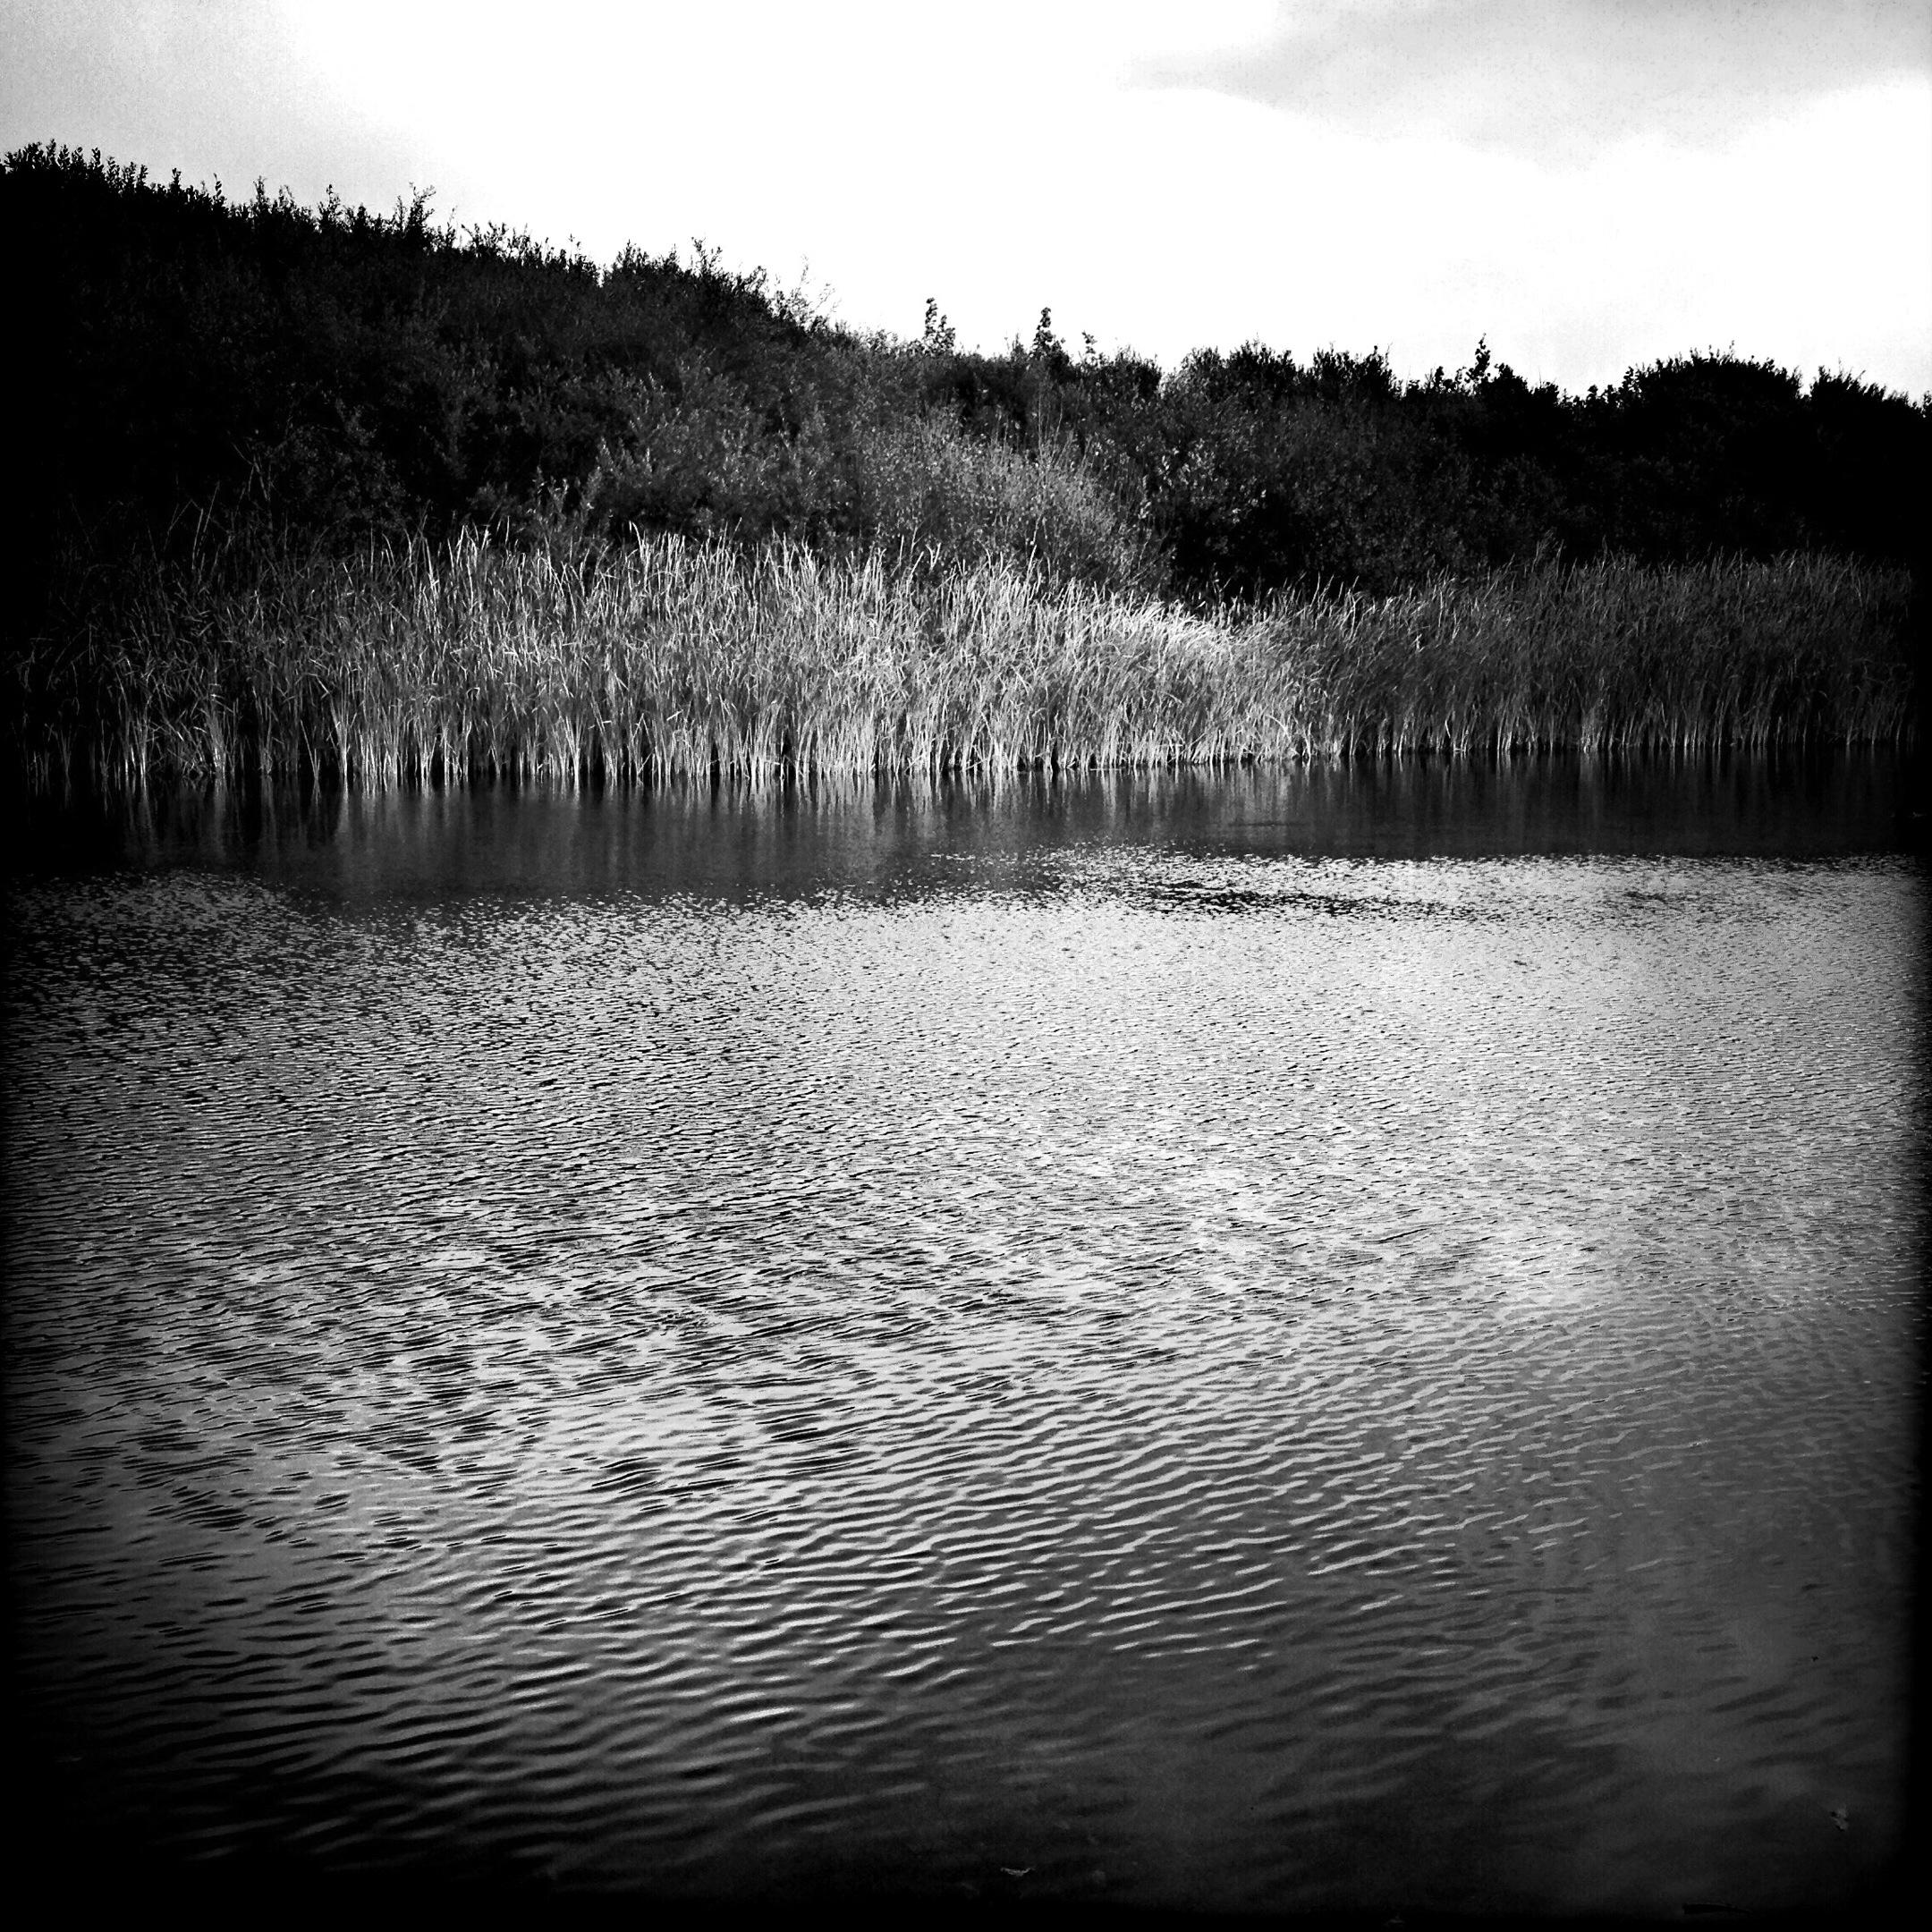 Rippling River, 2014